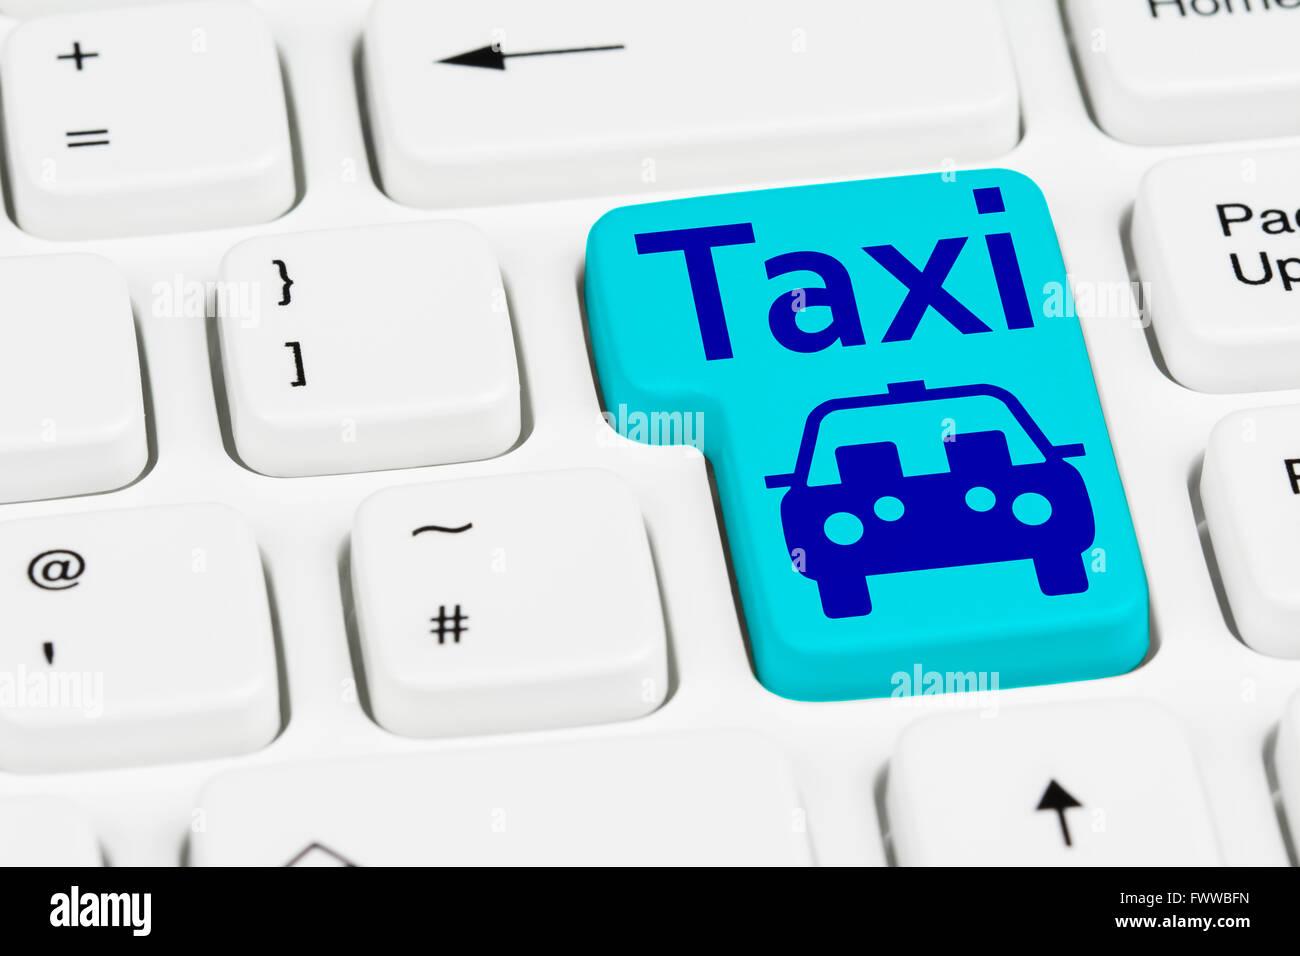 taxi-button-on-a-computer-keyboard-FWWBF